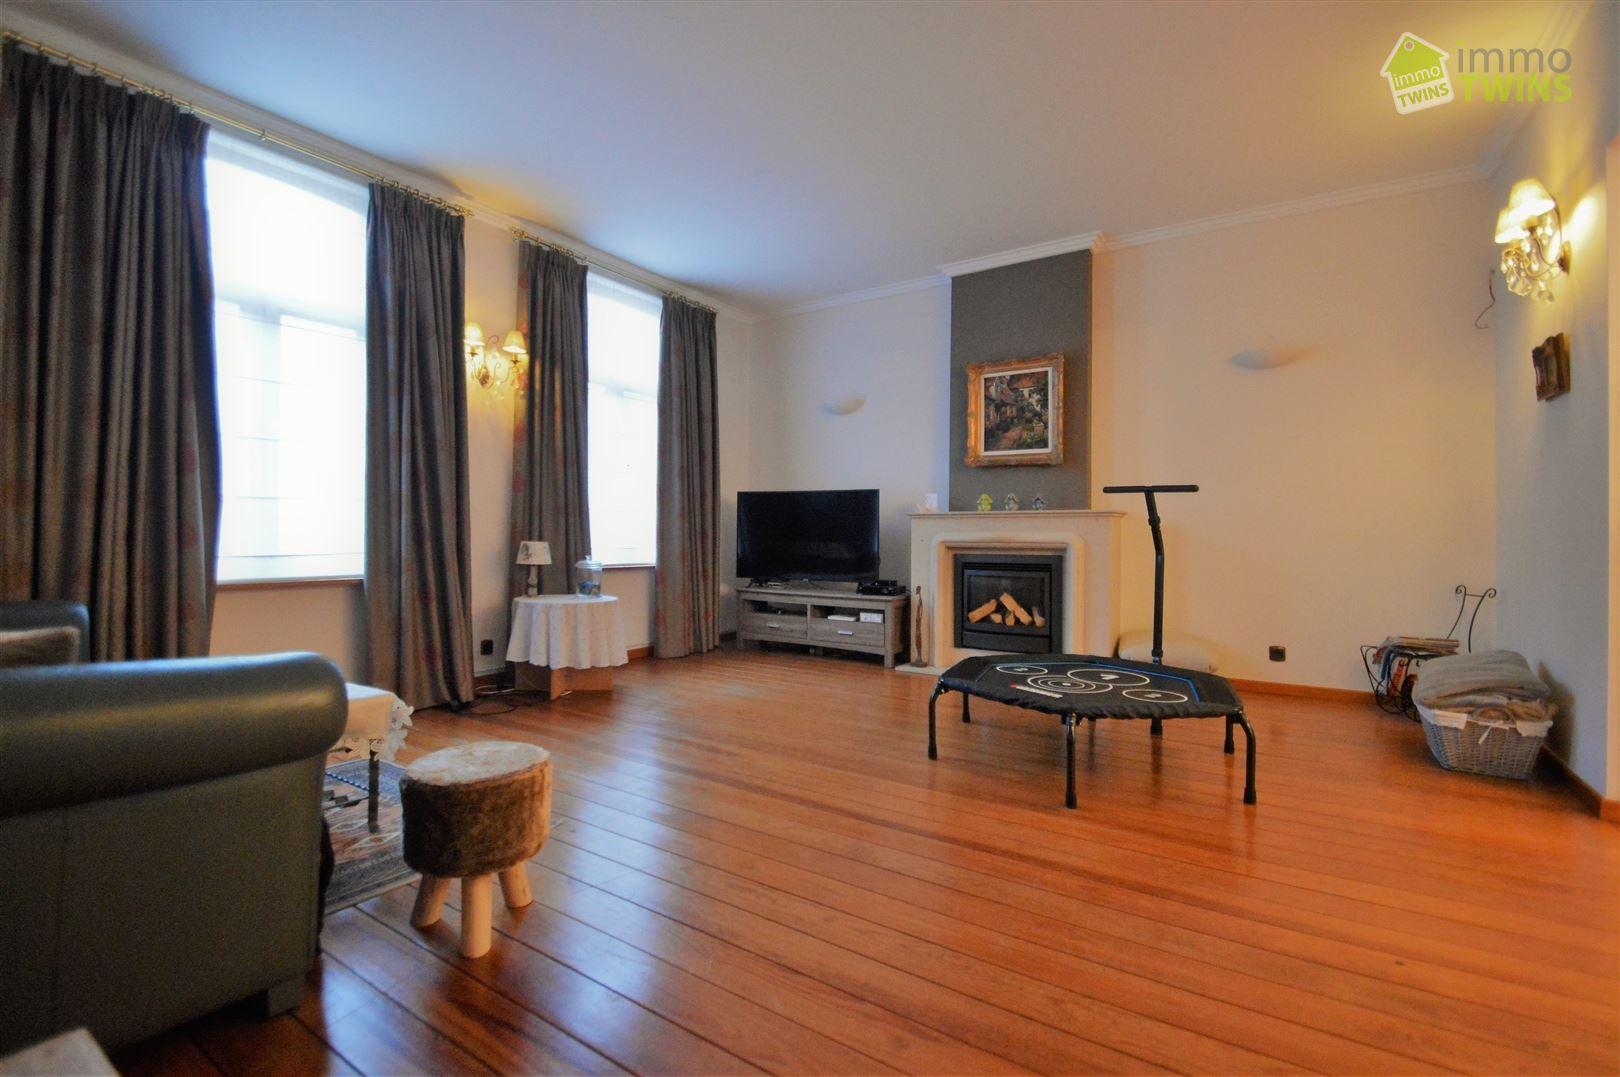 Foto 2 : Duplex/Penthouse te 2890 SINT-AMANDS (België) - Prijs € 429.000